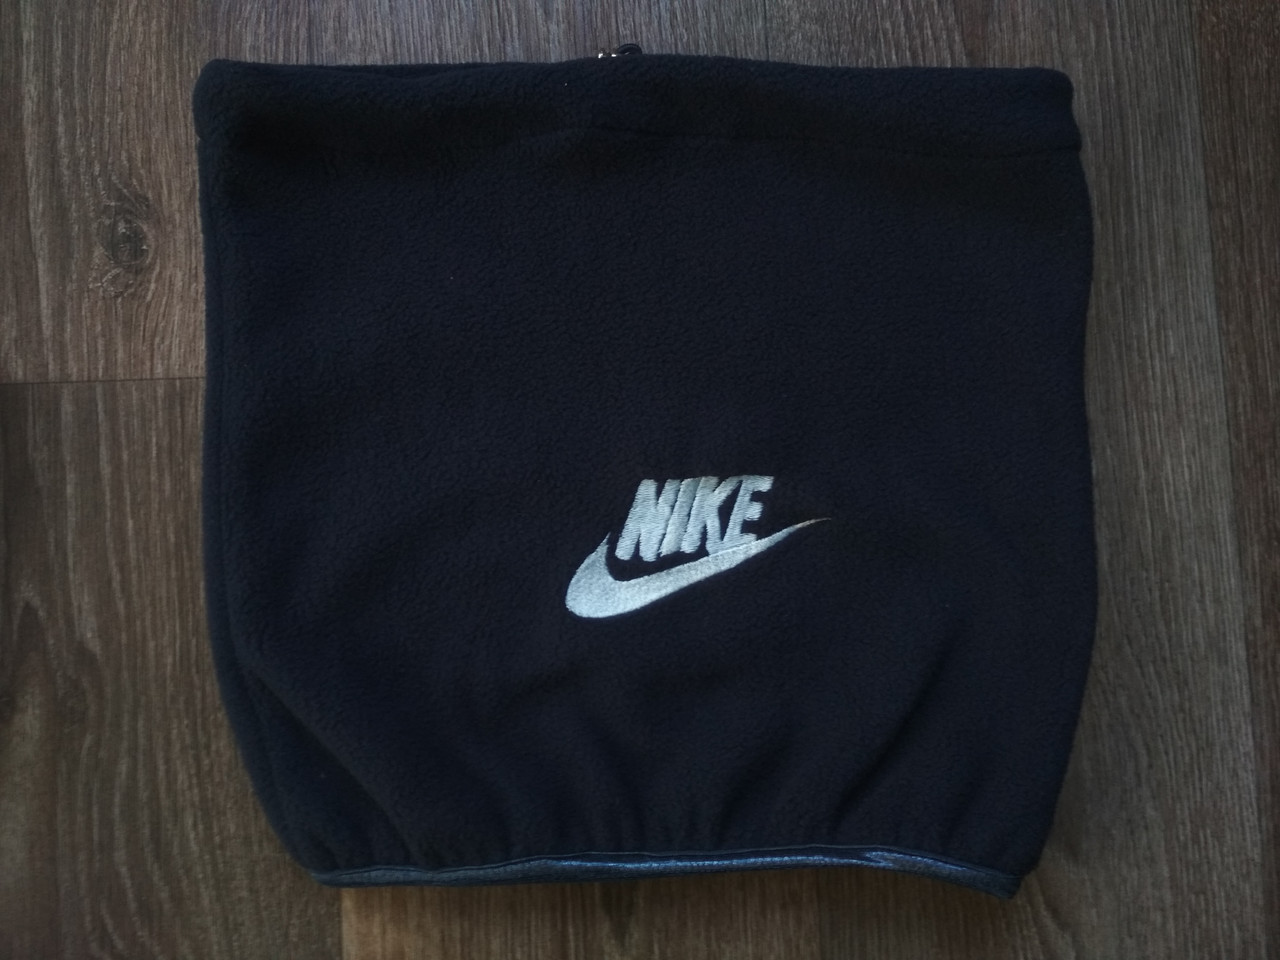 Горловик Nike на утепленном флисе (темно-синий) реплика